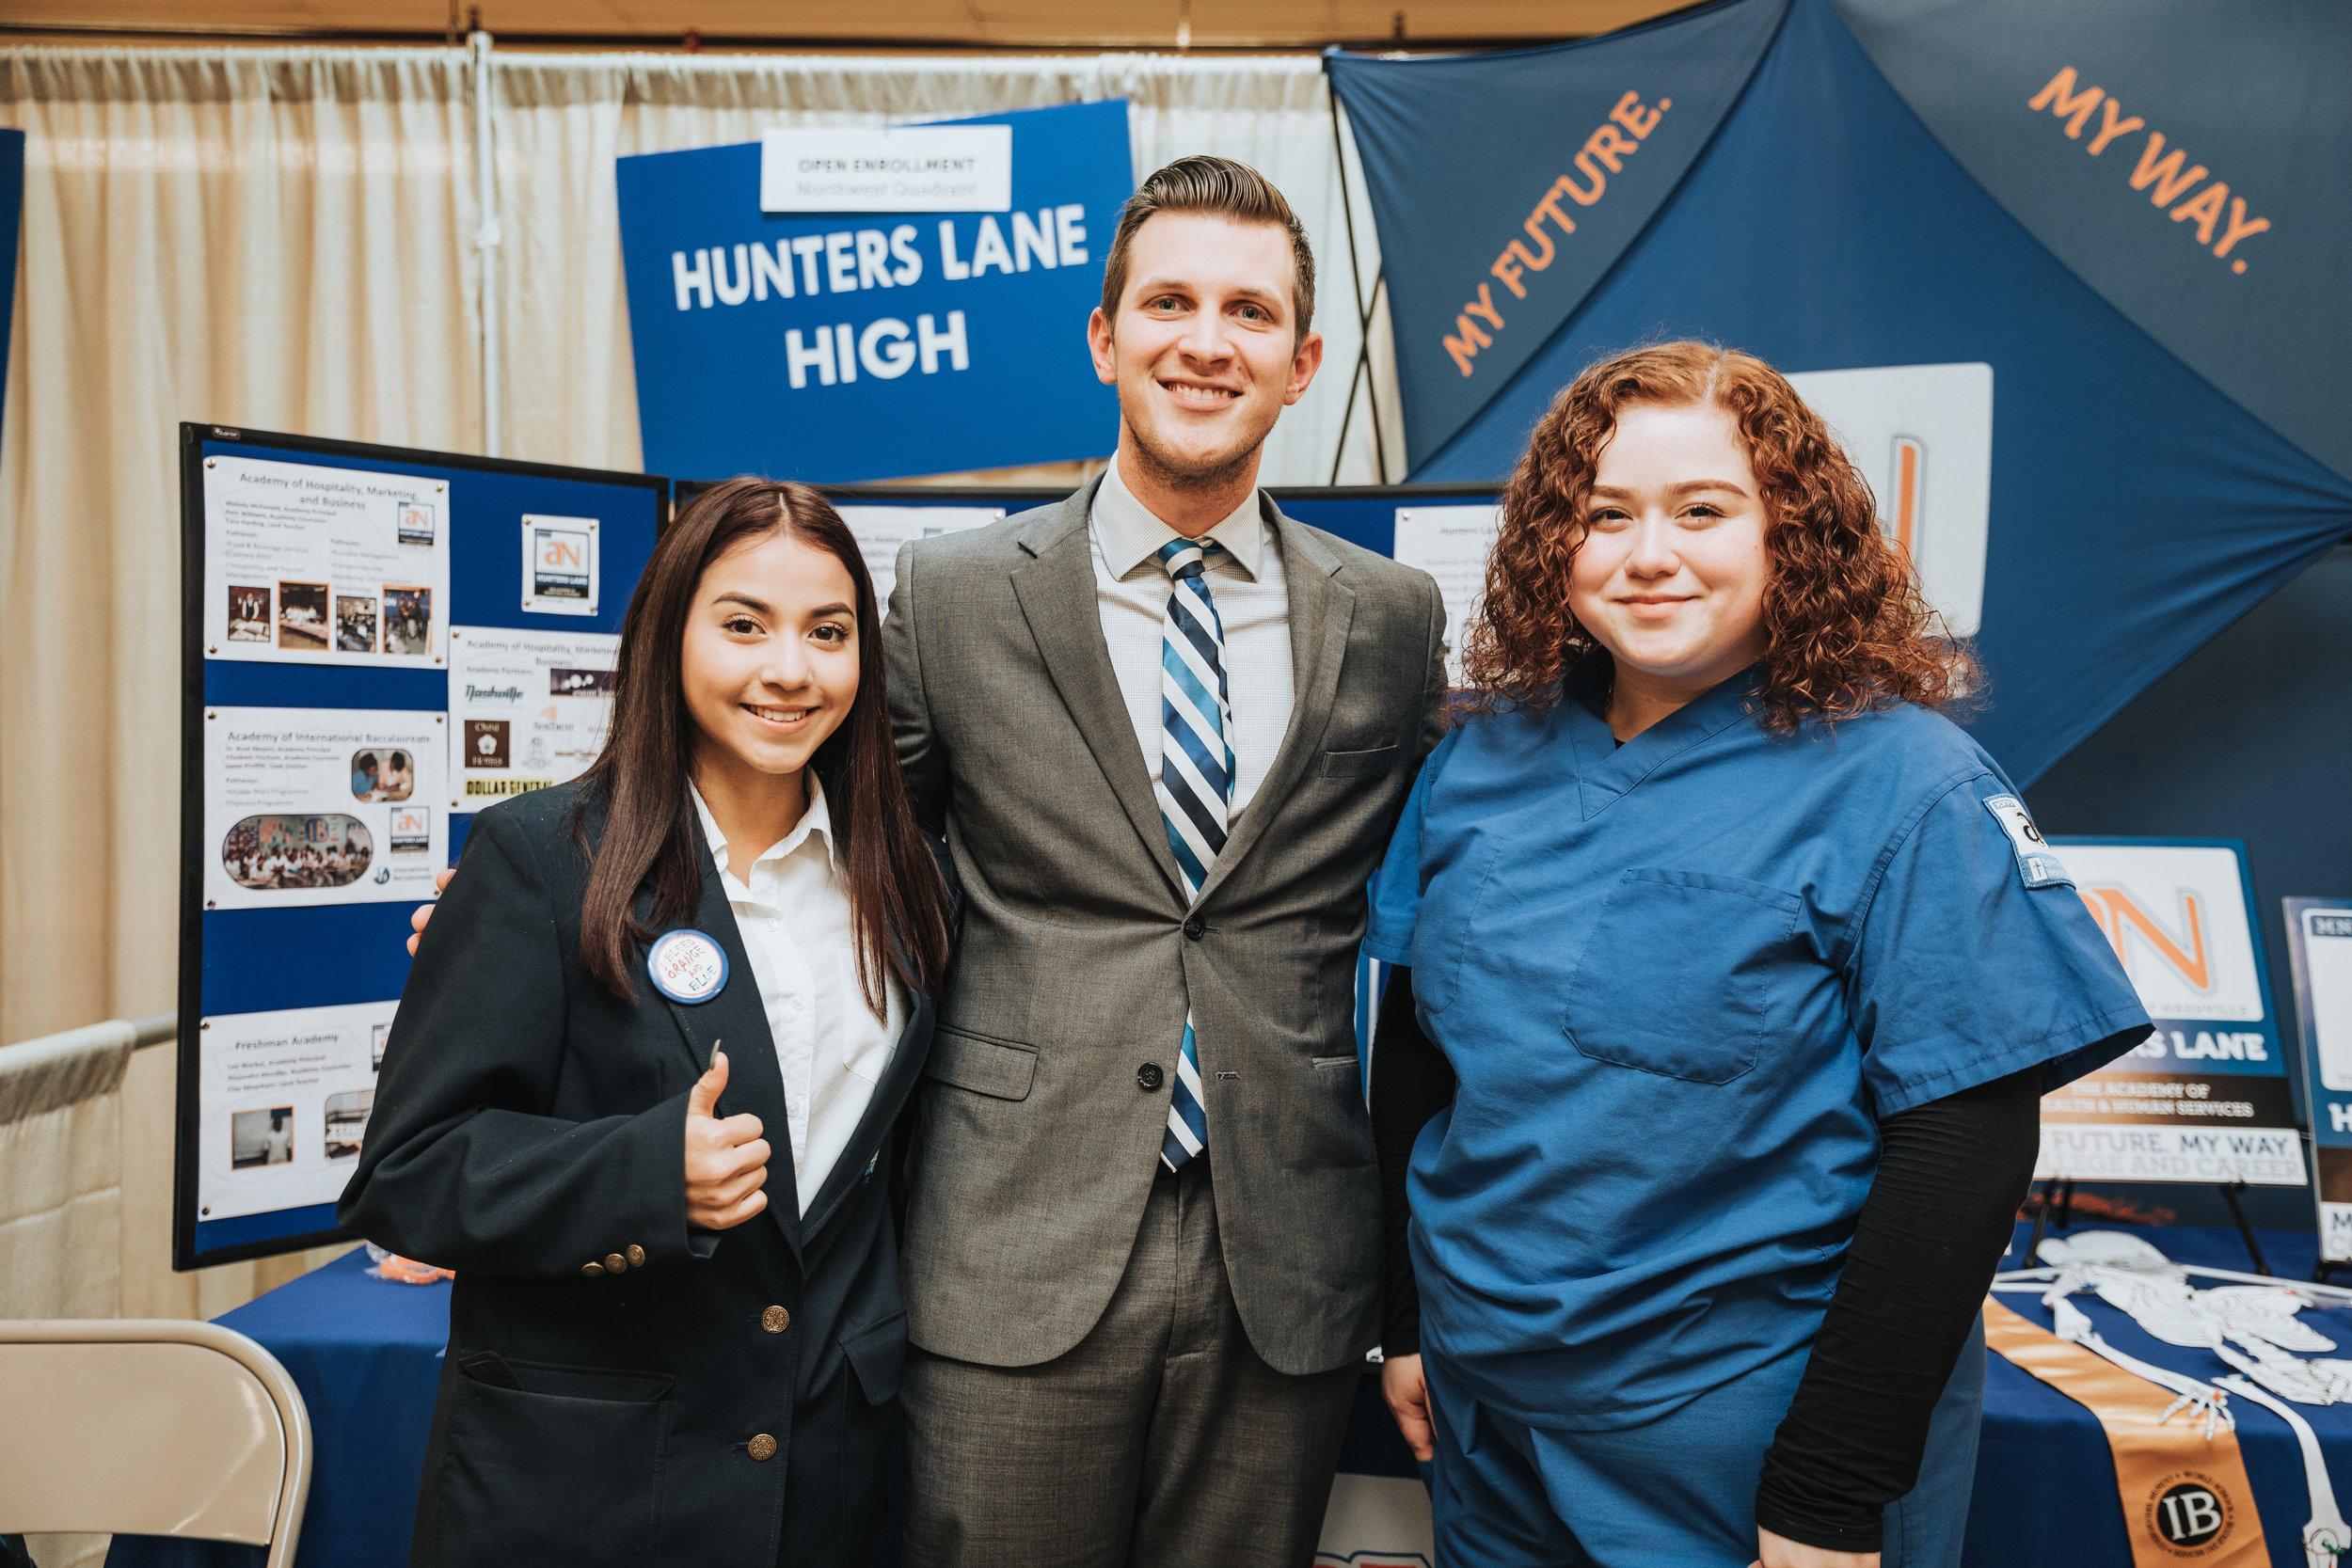 Hunters Lane High School Staff